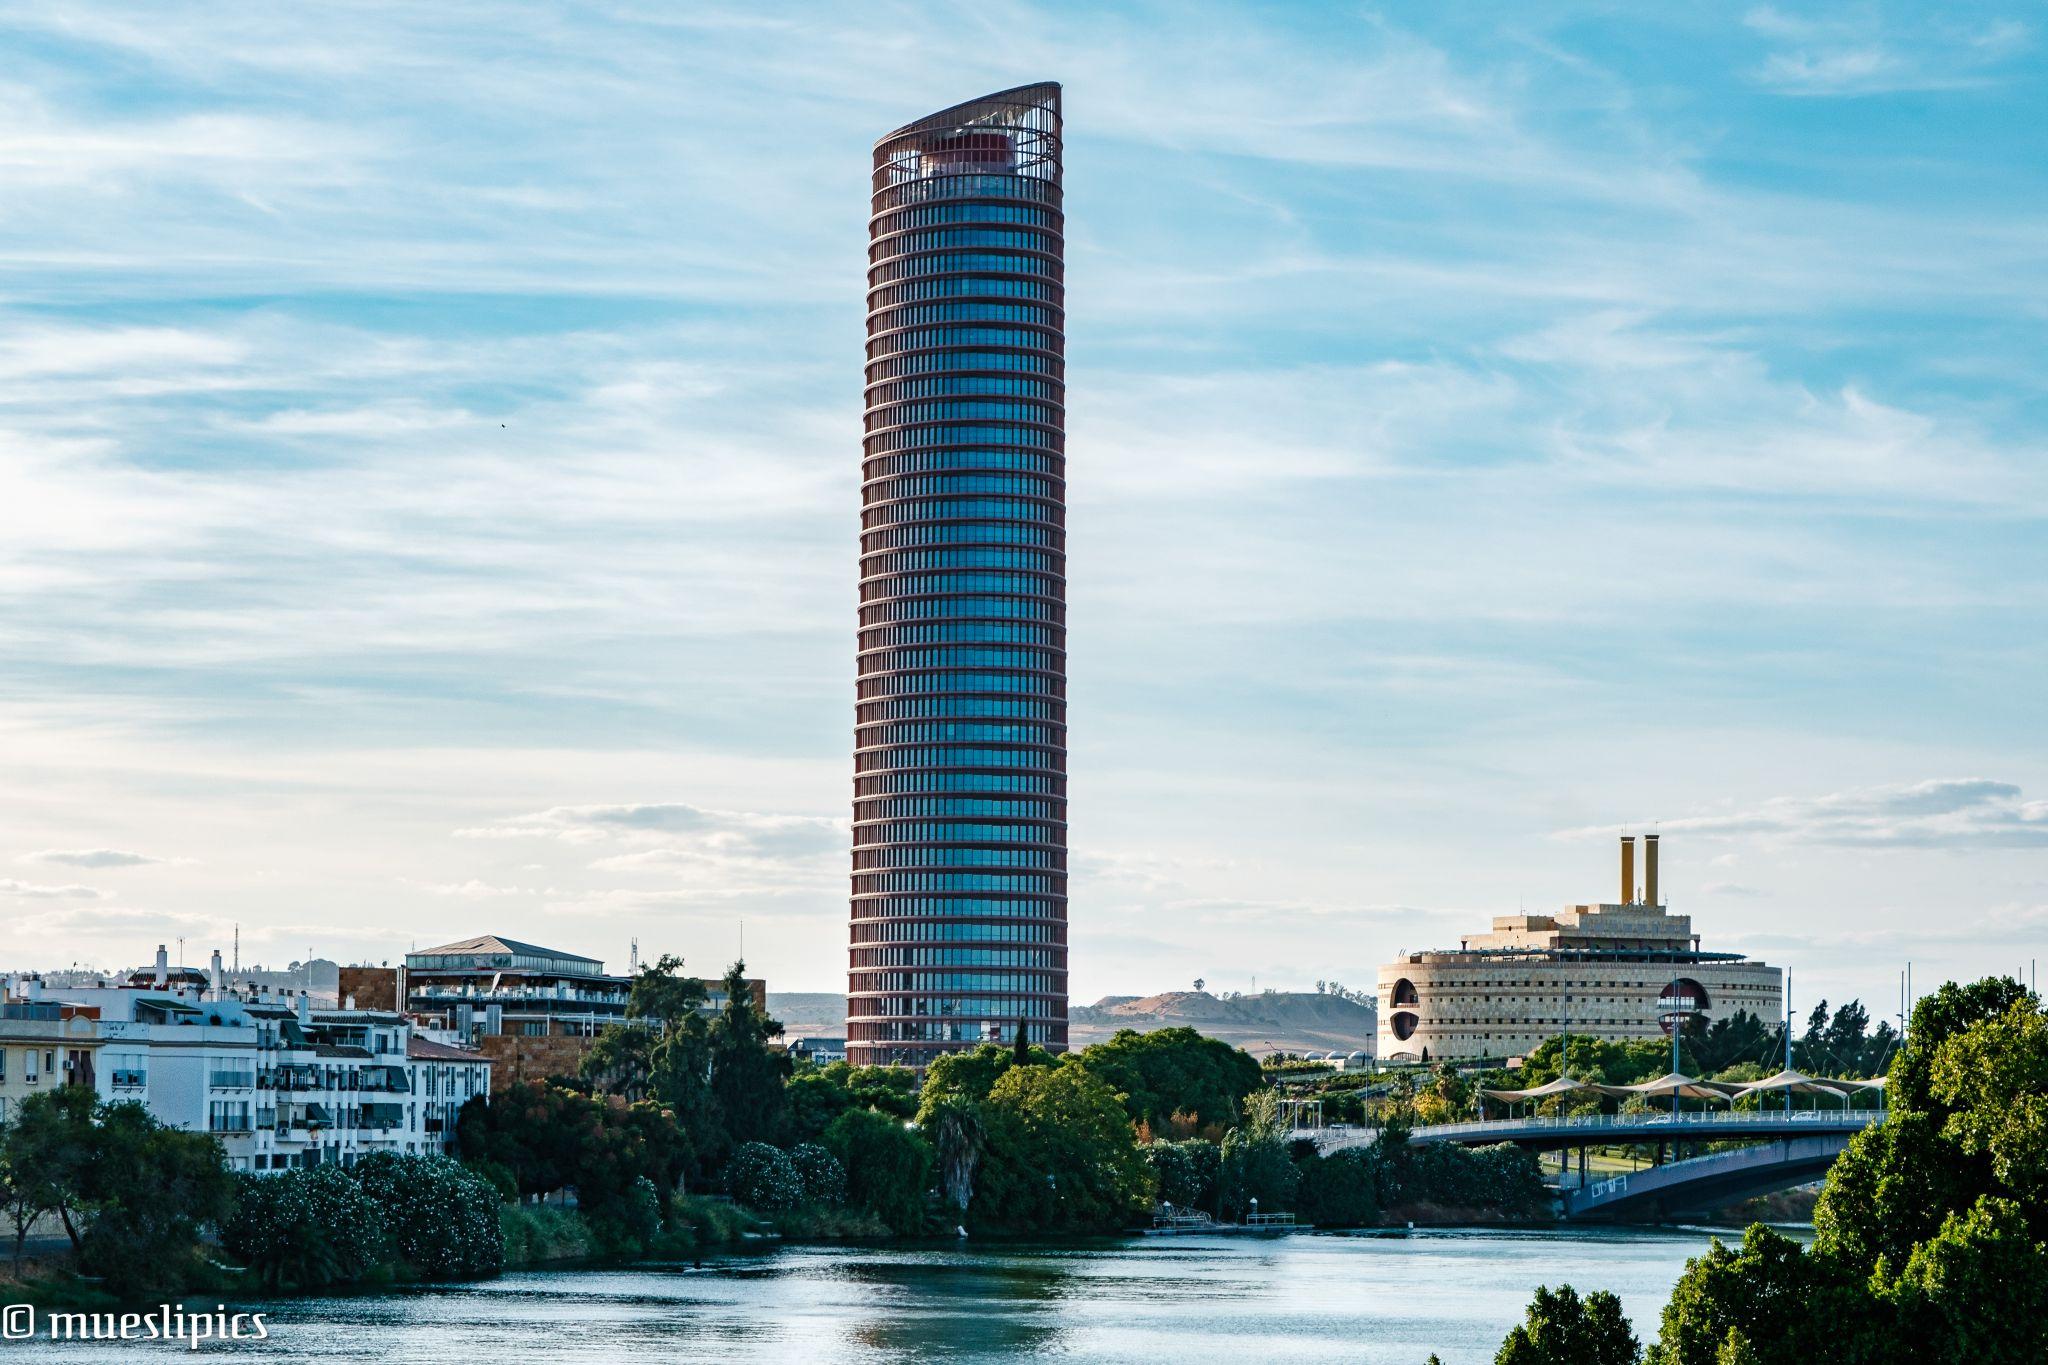 Torre de Sevilla, Spain